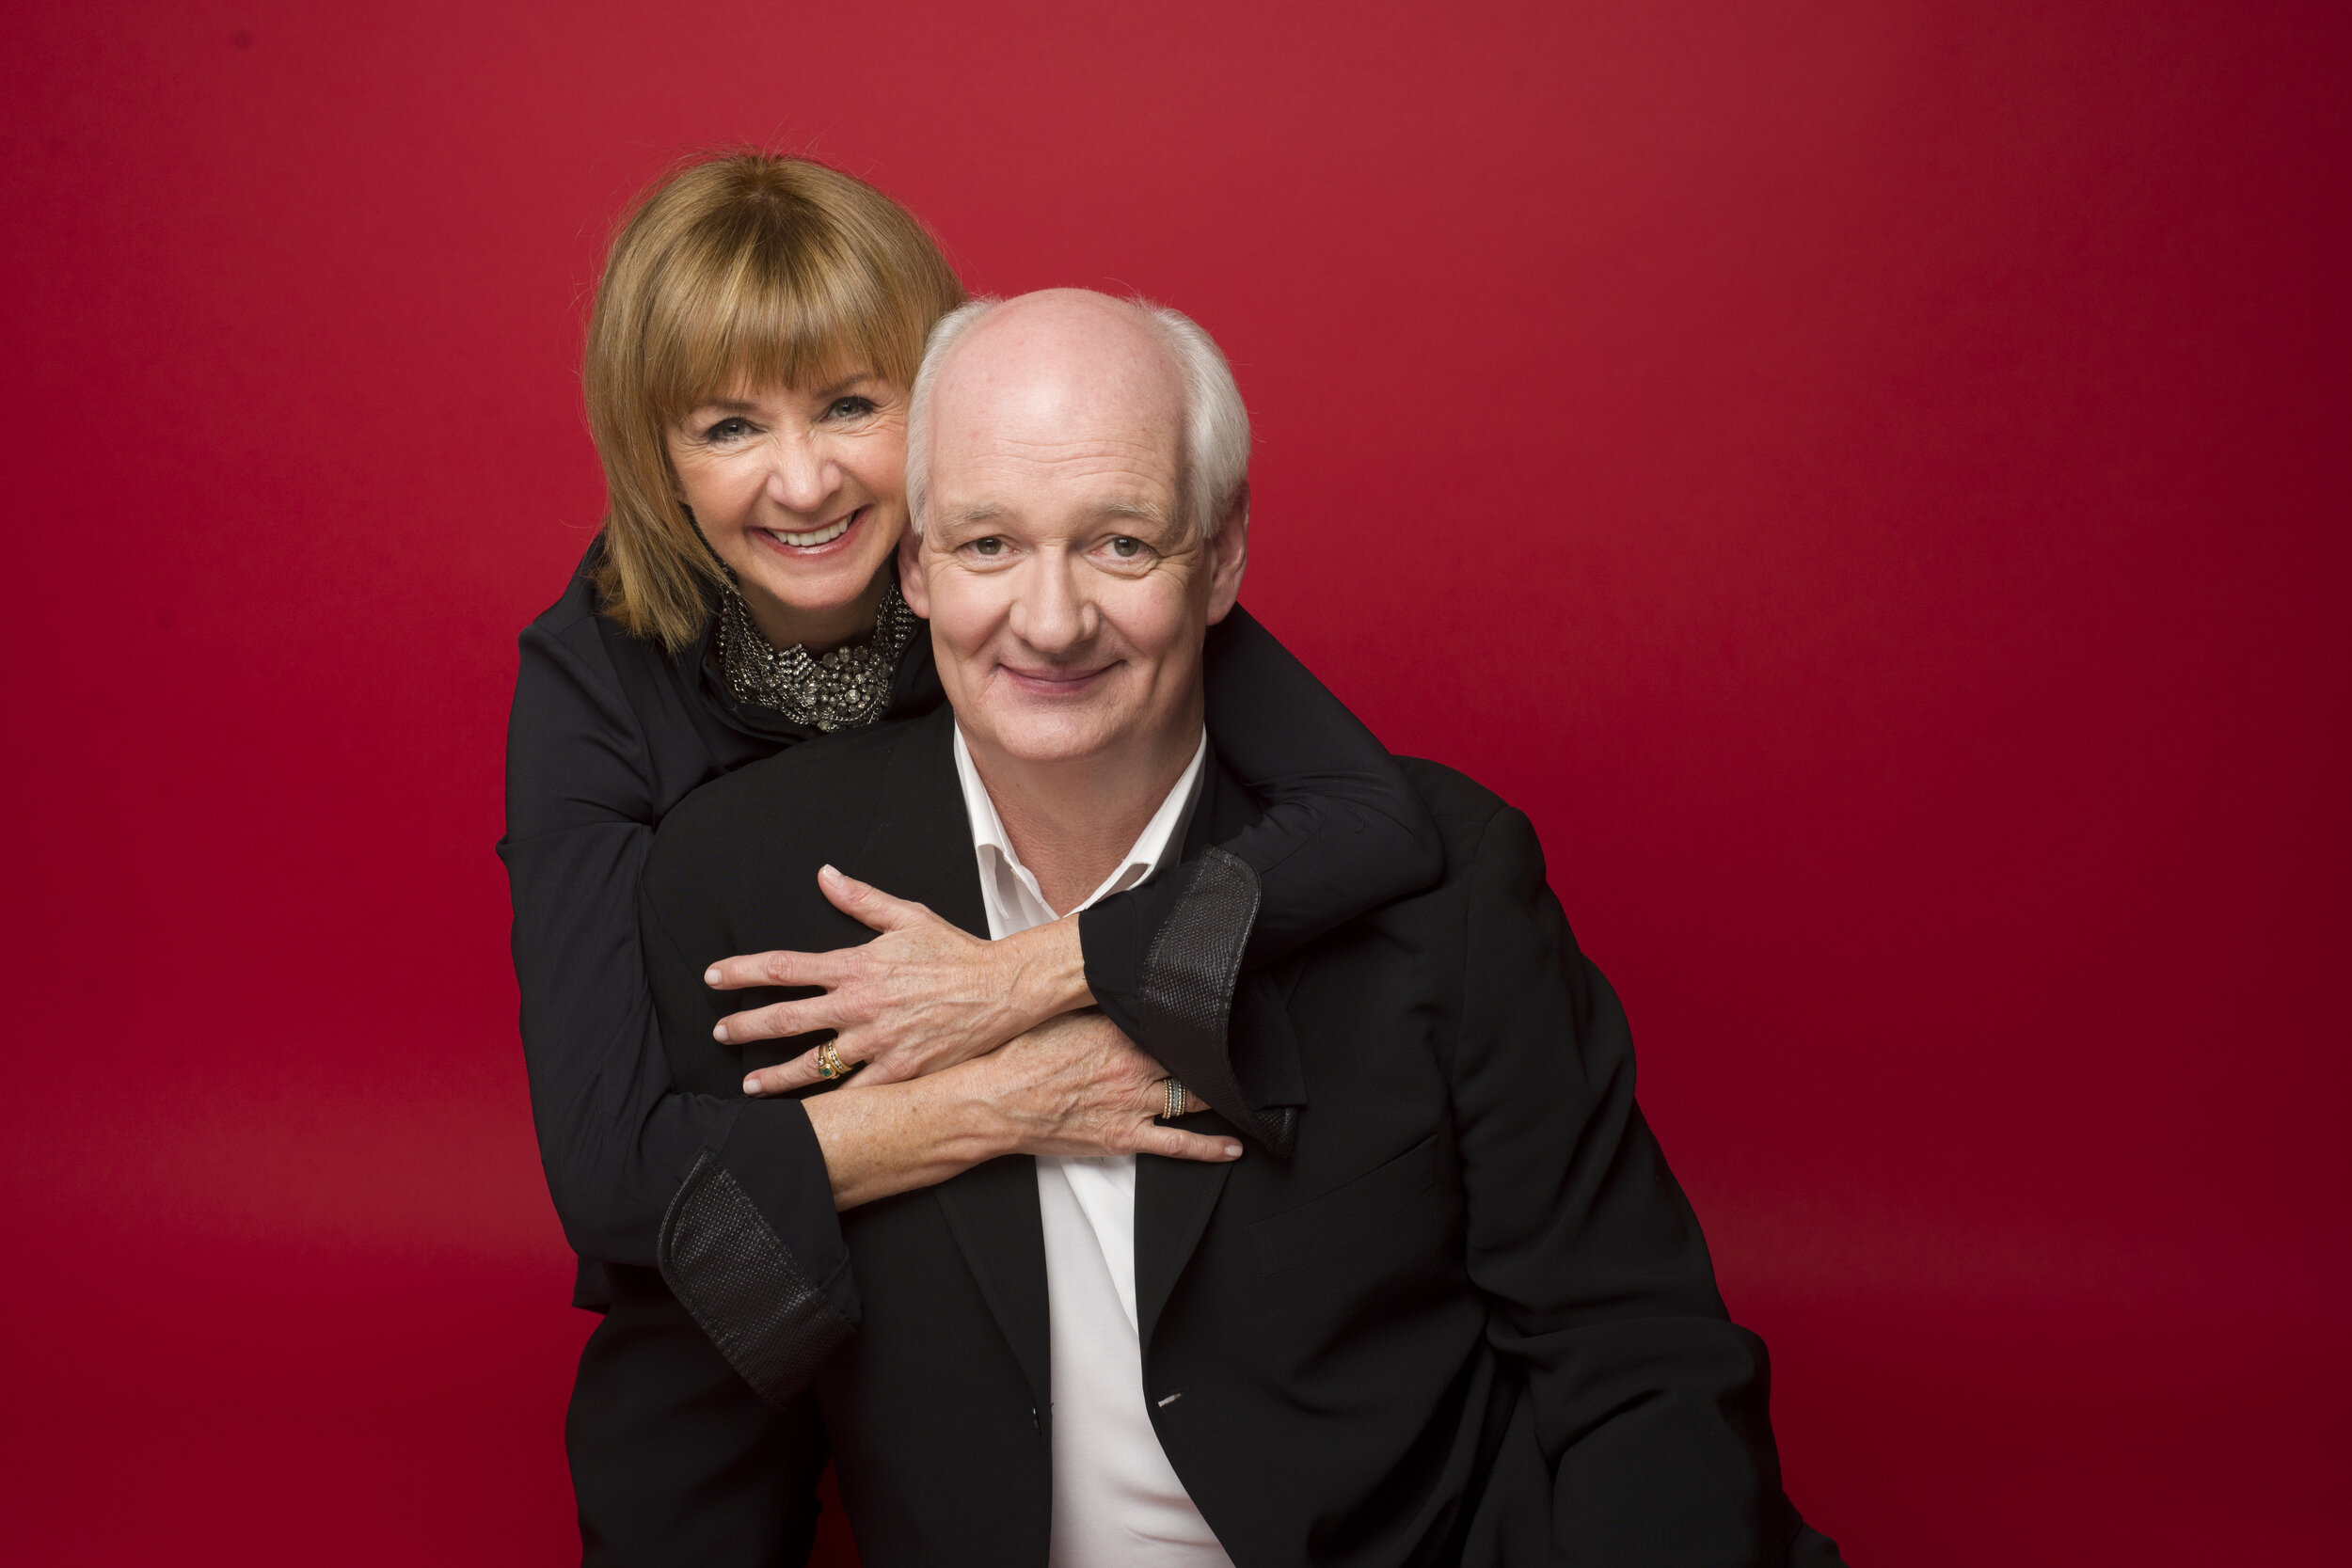 Toronto Pflag Ally Award hosts COLIN MOCHRIE and DEBRA McGRATH